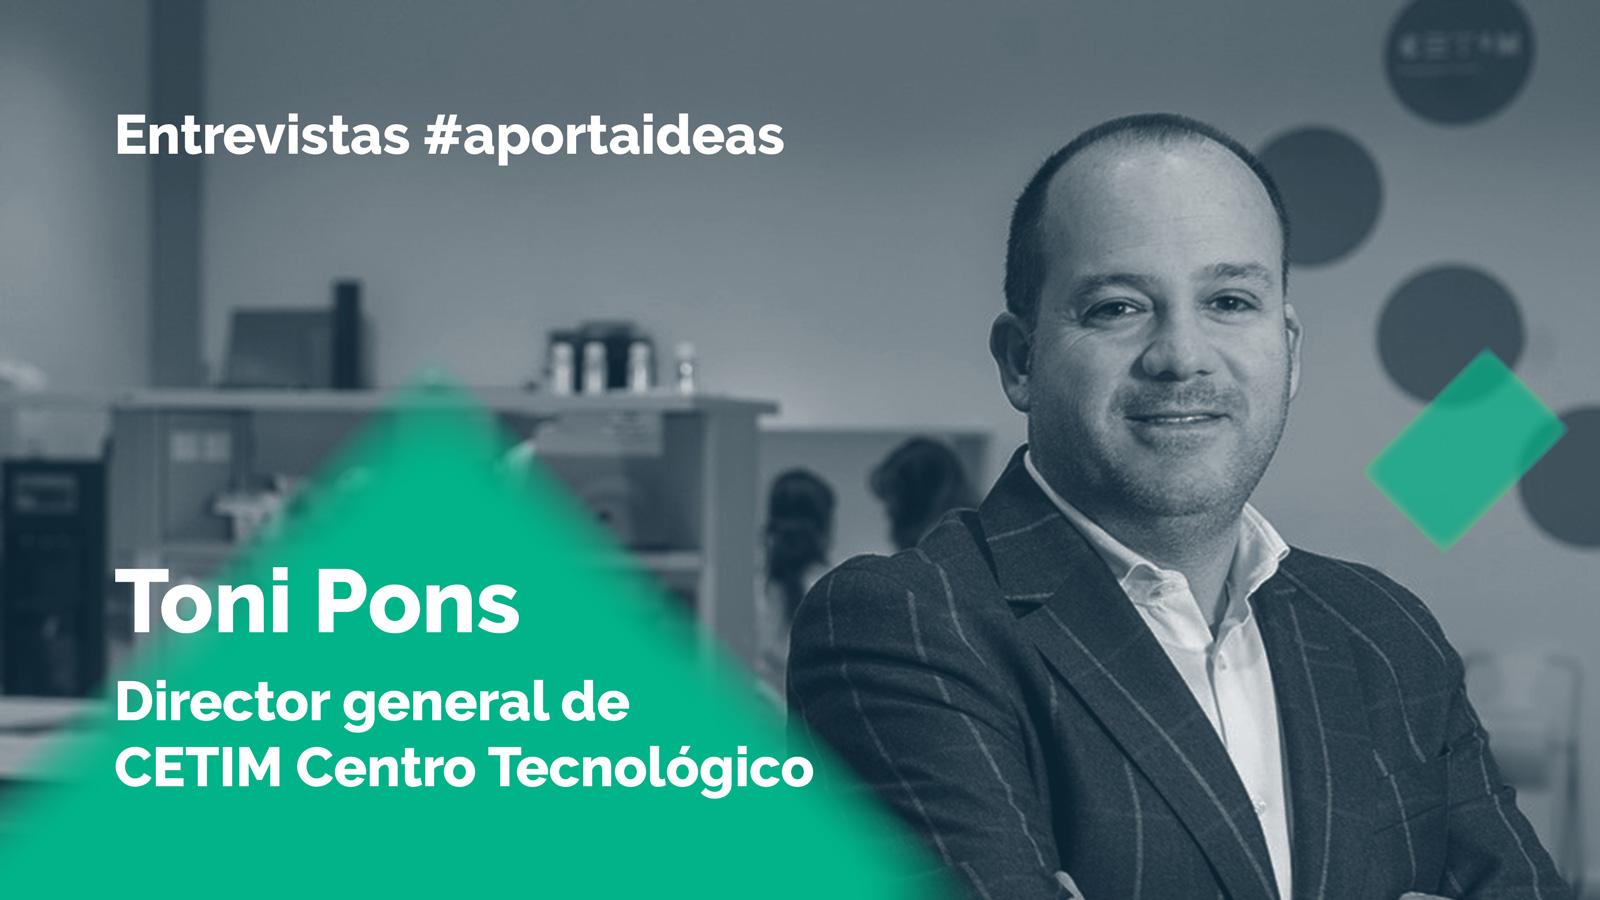 Entrevista #aportaideas a Toni Pons Samaranch, director general CETIM Centro Tecnológico